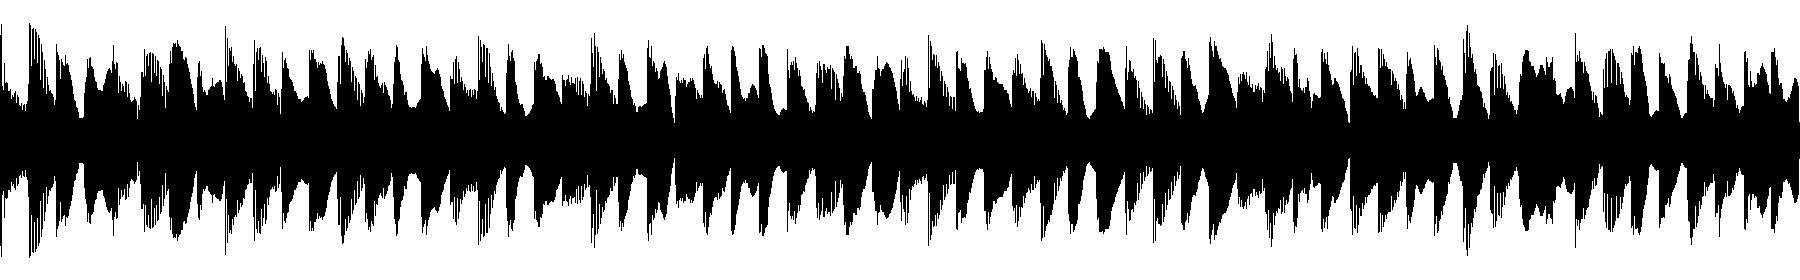 seq2 160